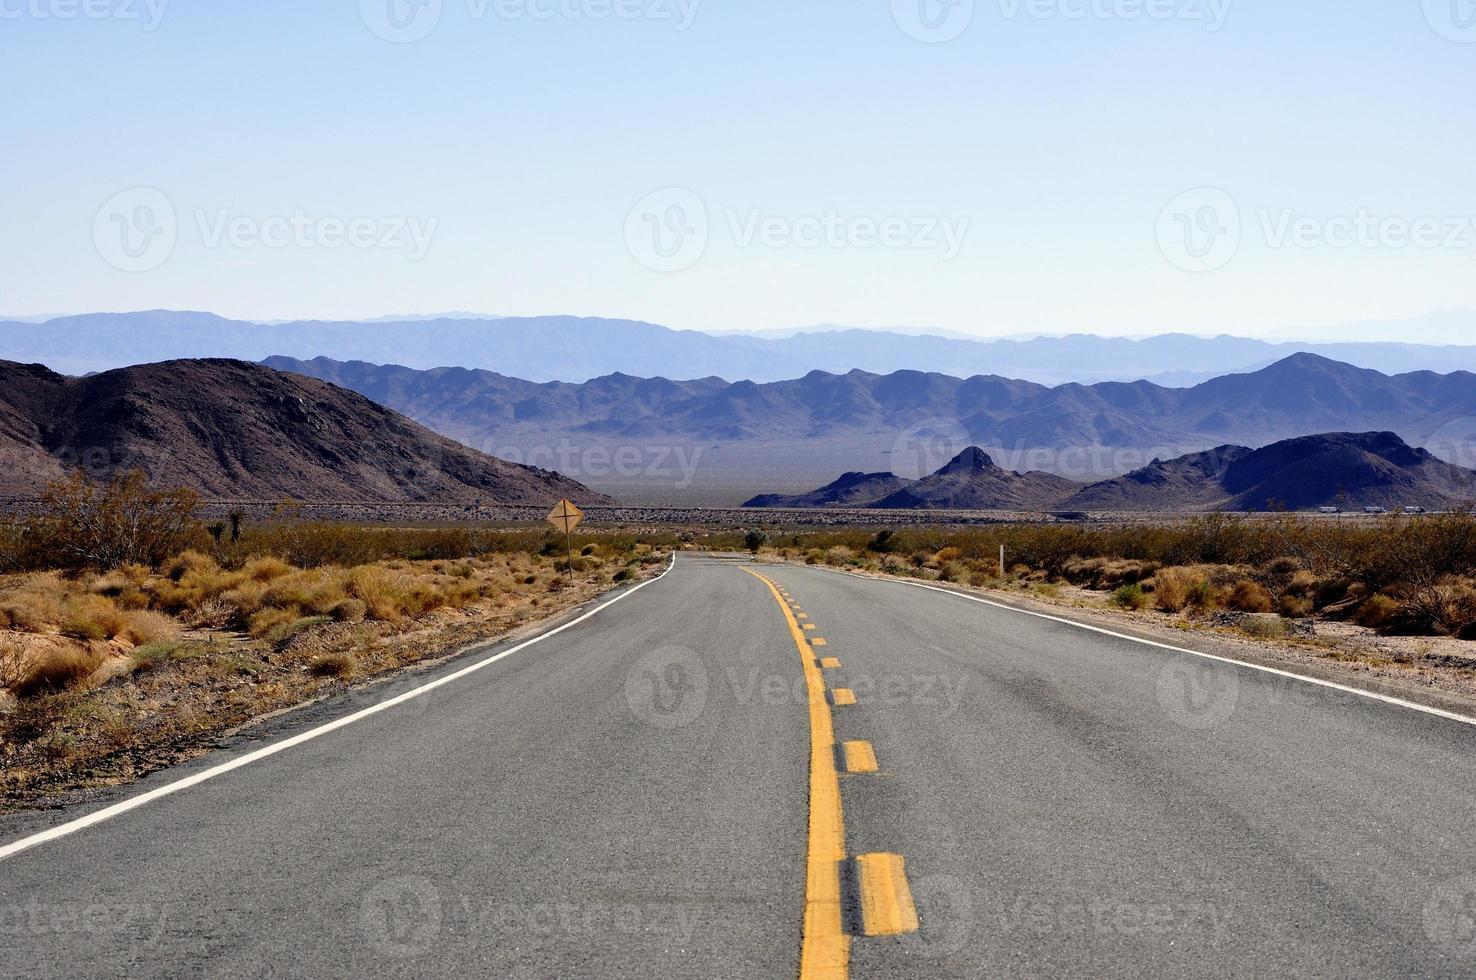 Las Vegas Dessert road photo